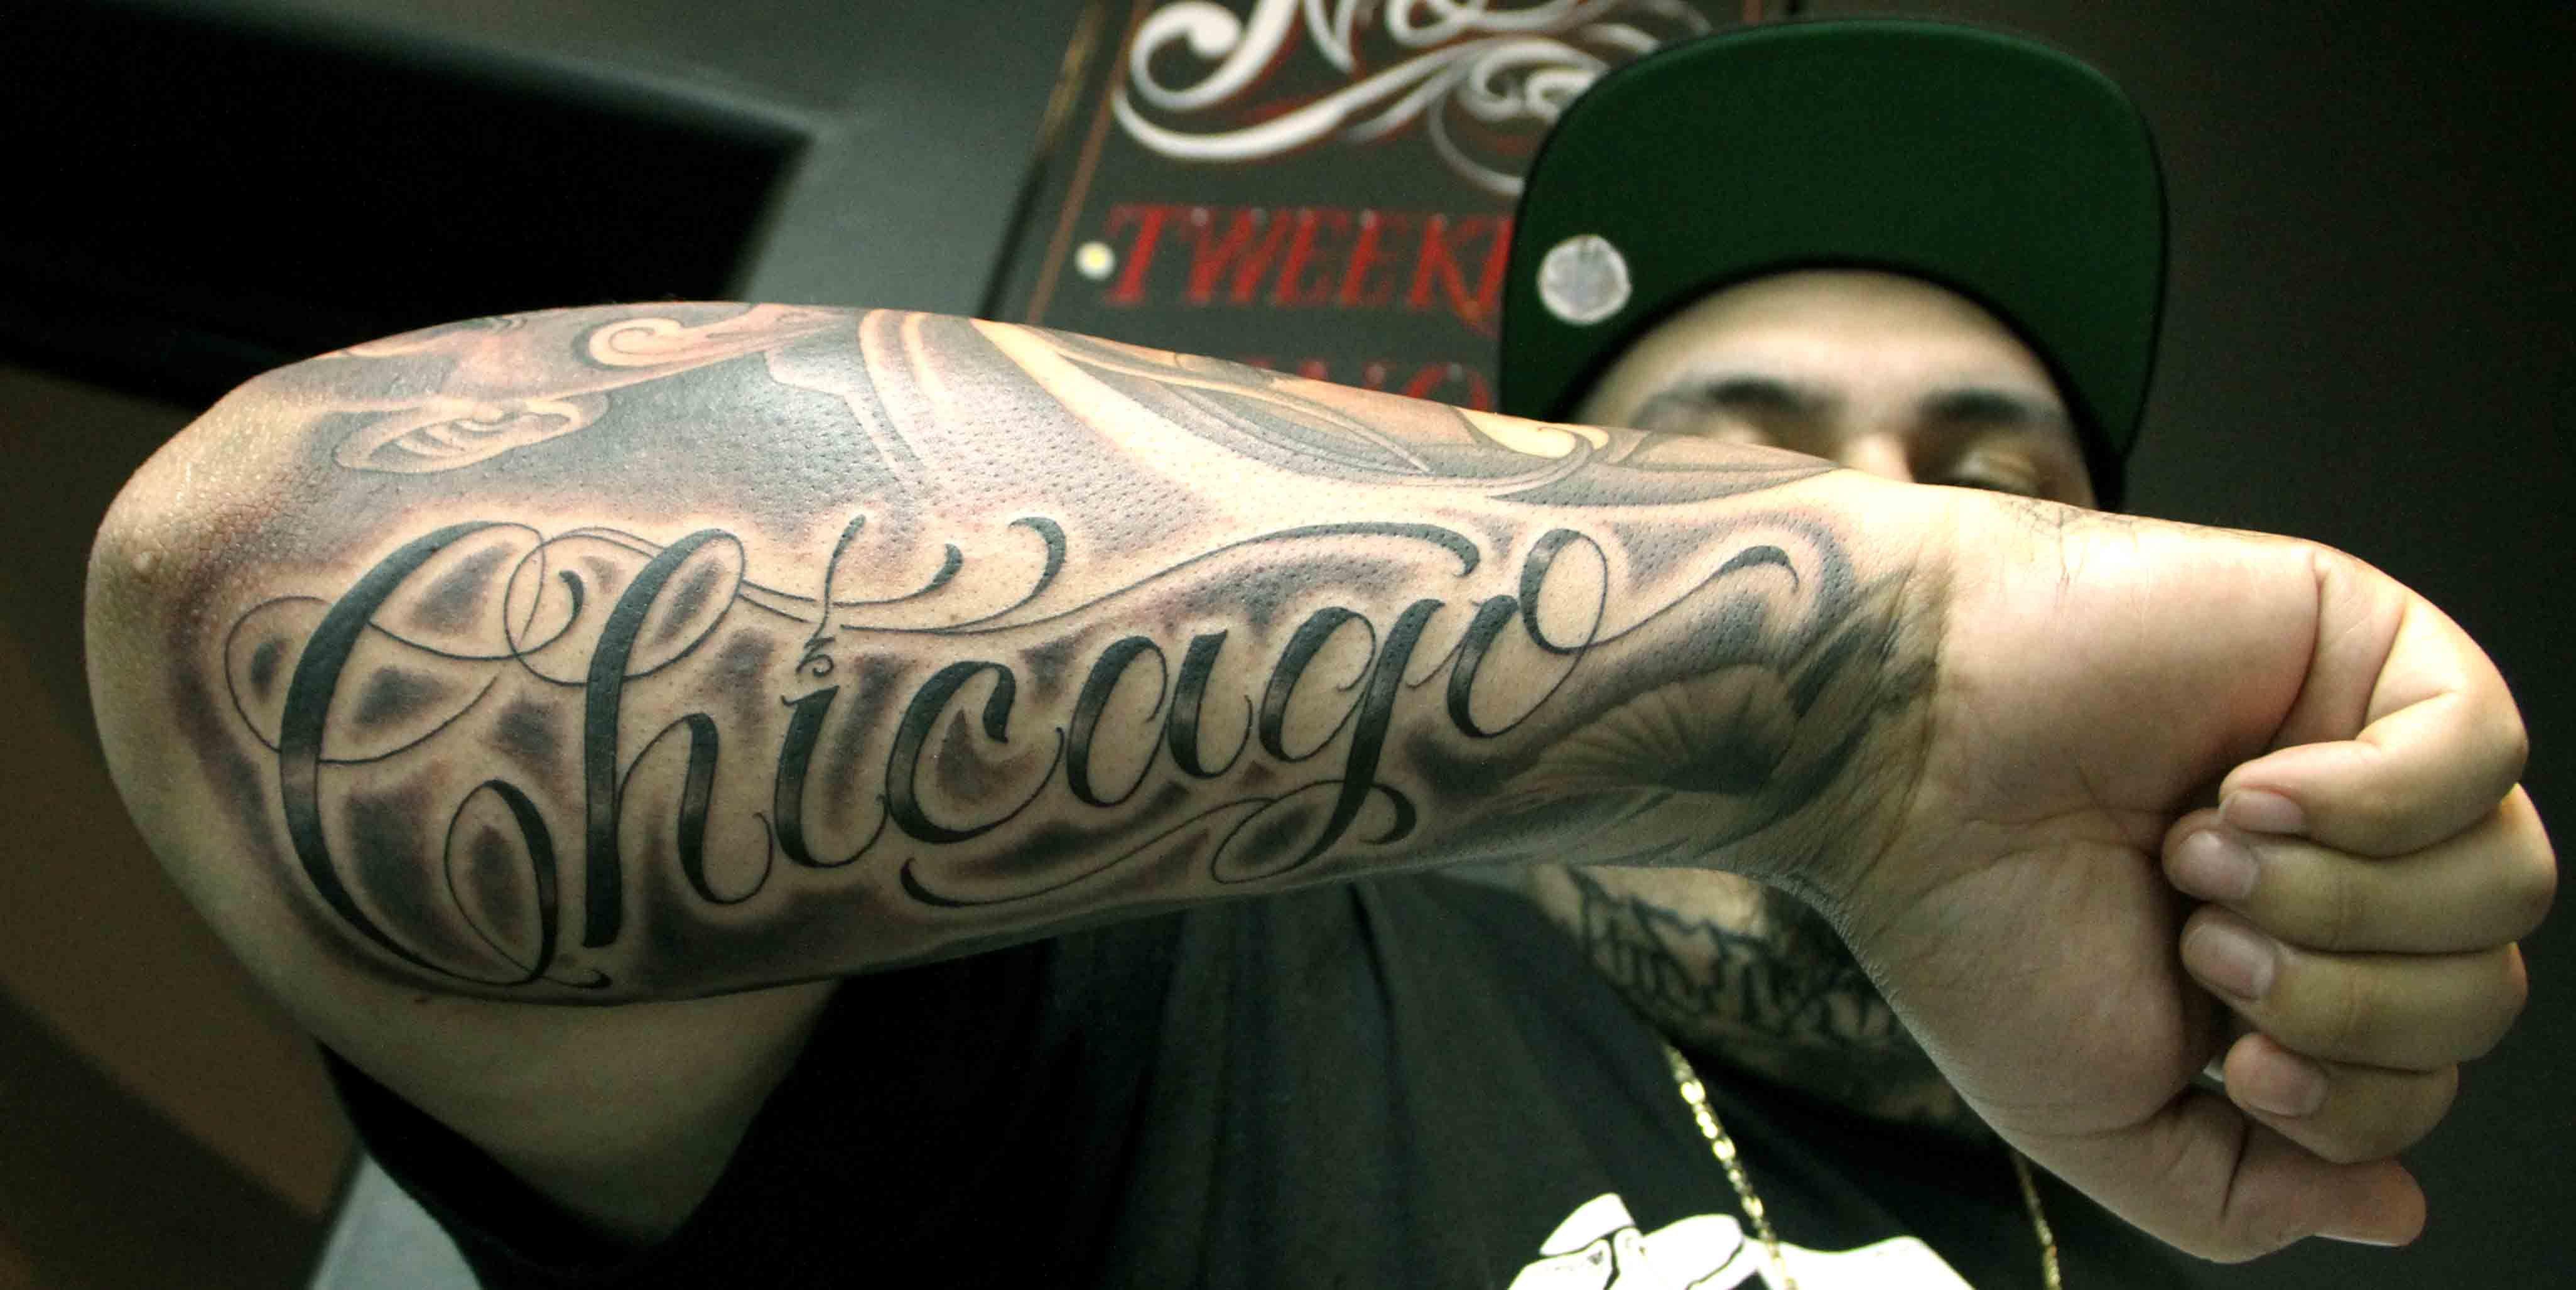 Chicago Blackandgrey Tattoo Mistercartoon Script Ink Chicago Tattoo Tattoos Chicago Flag Tattoo